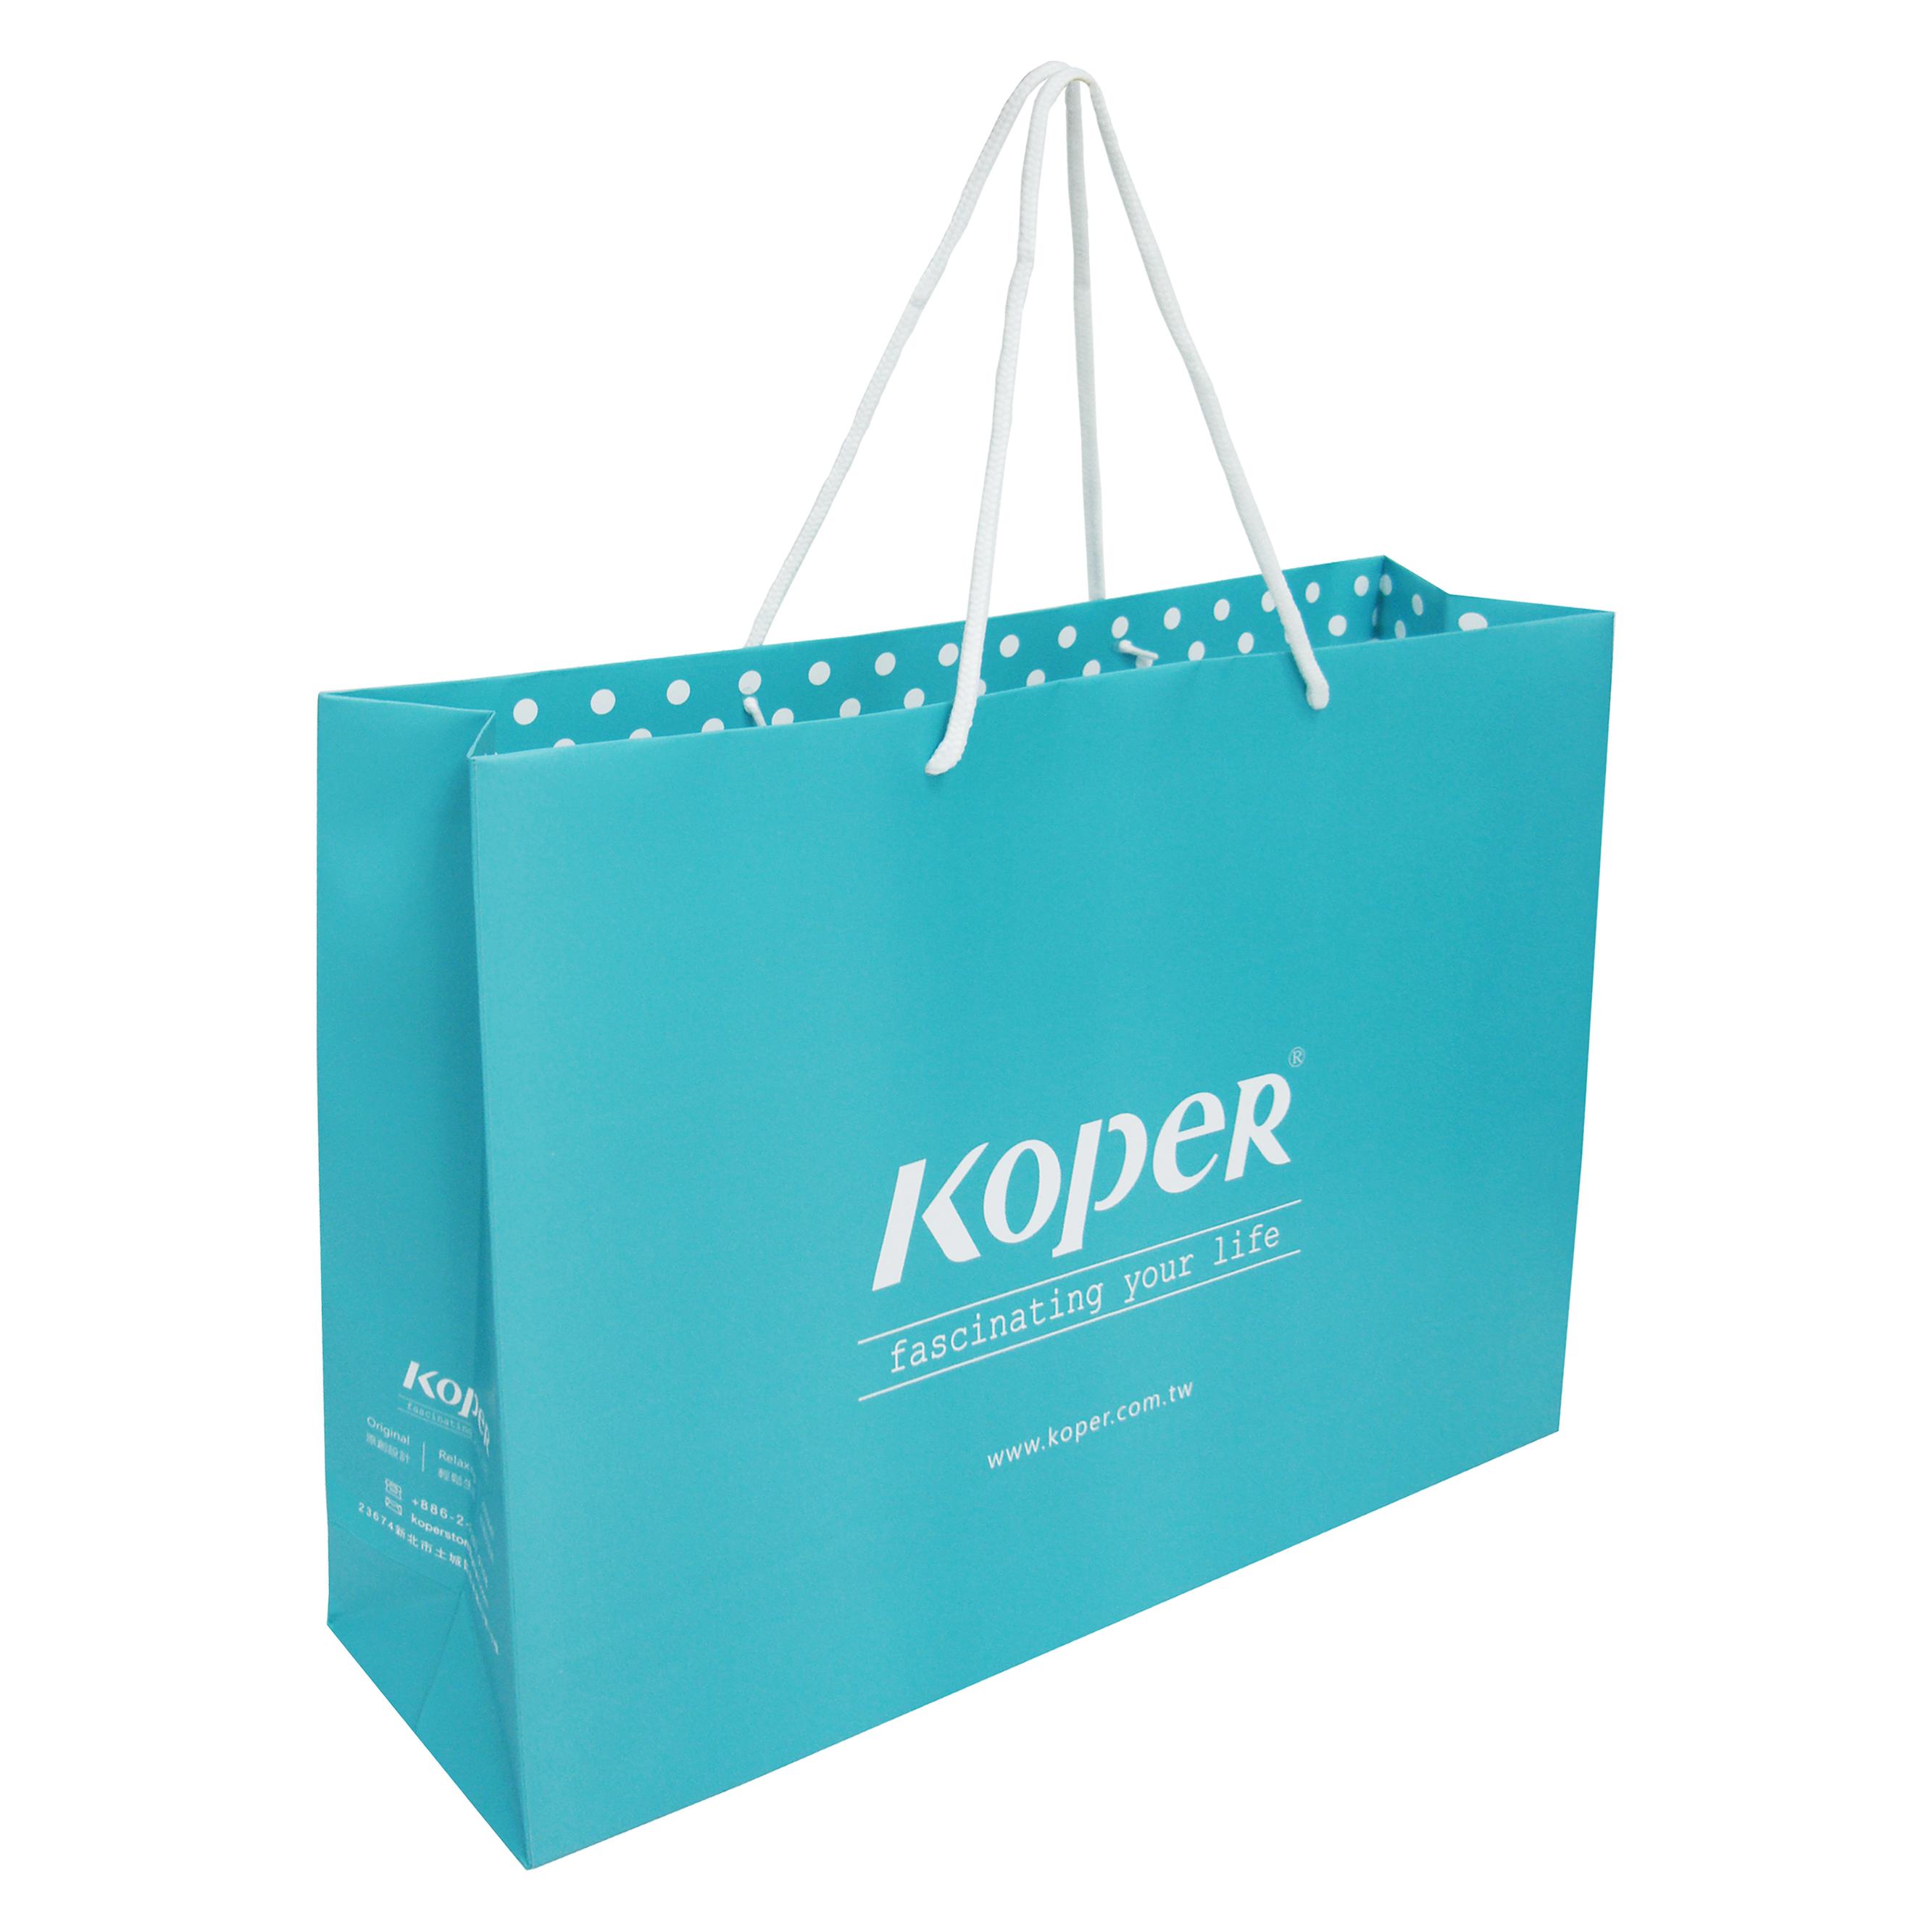 064864ae0a KOPER brand can-back Paper bags - Designer KOPER